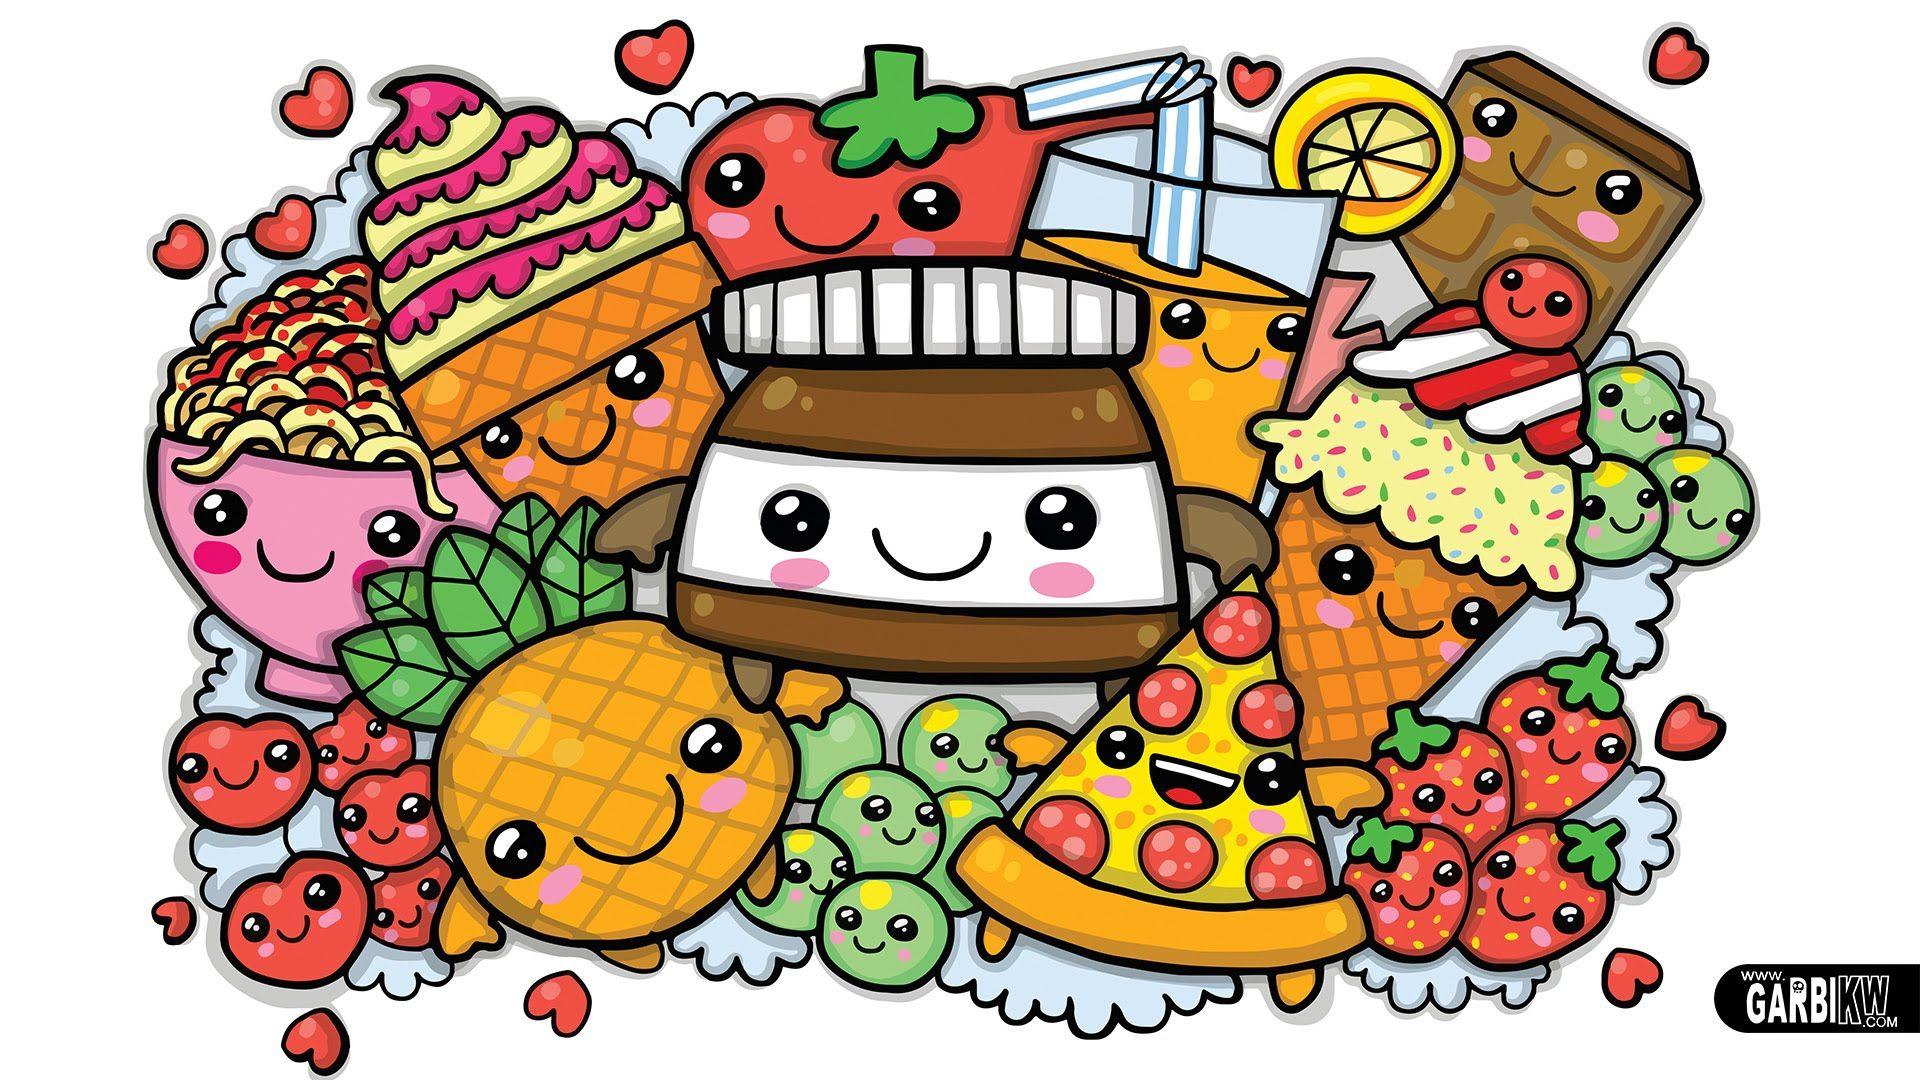 Coloring pages kawaii - Colouring A Cute Nutella And Kawaii Food Cute Graffiti By Garbi Kw